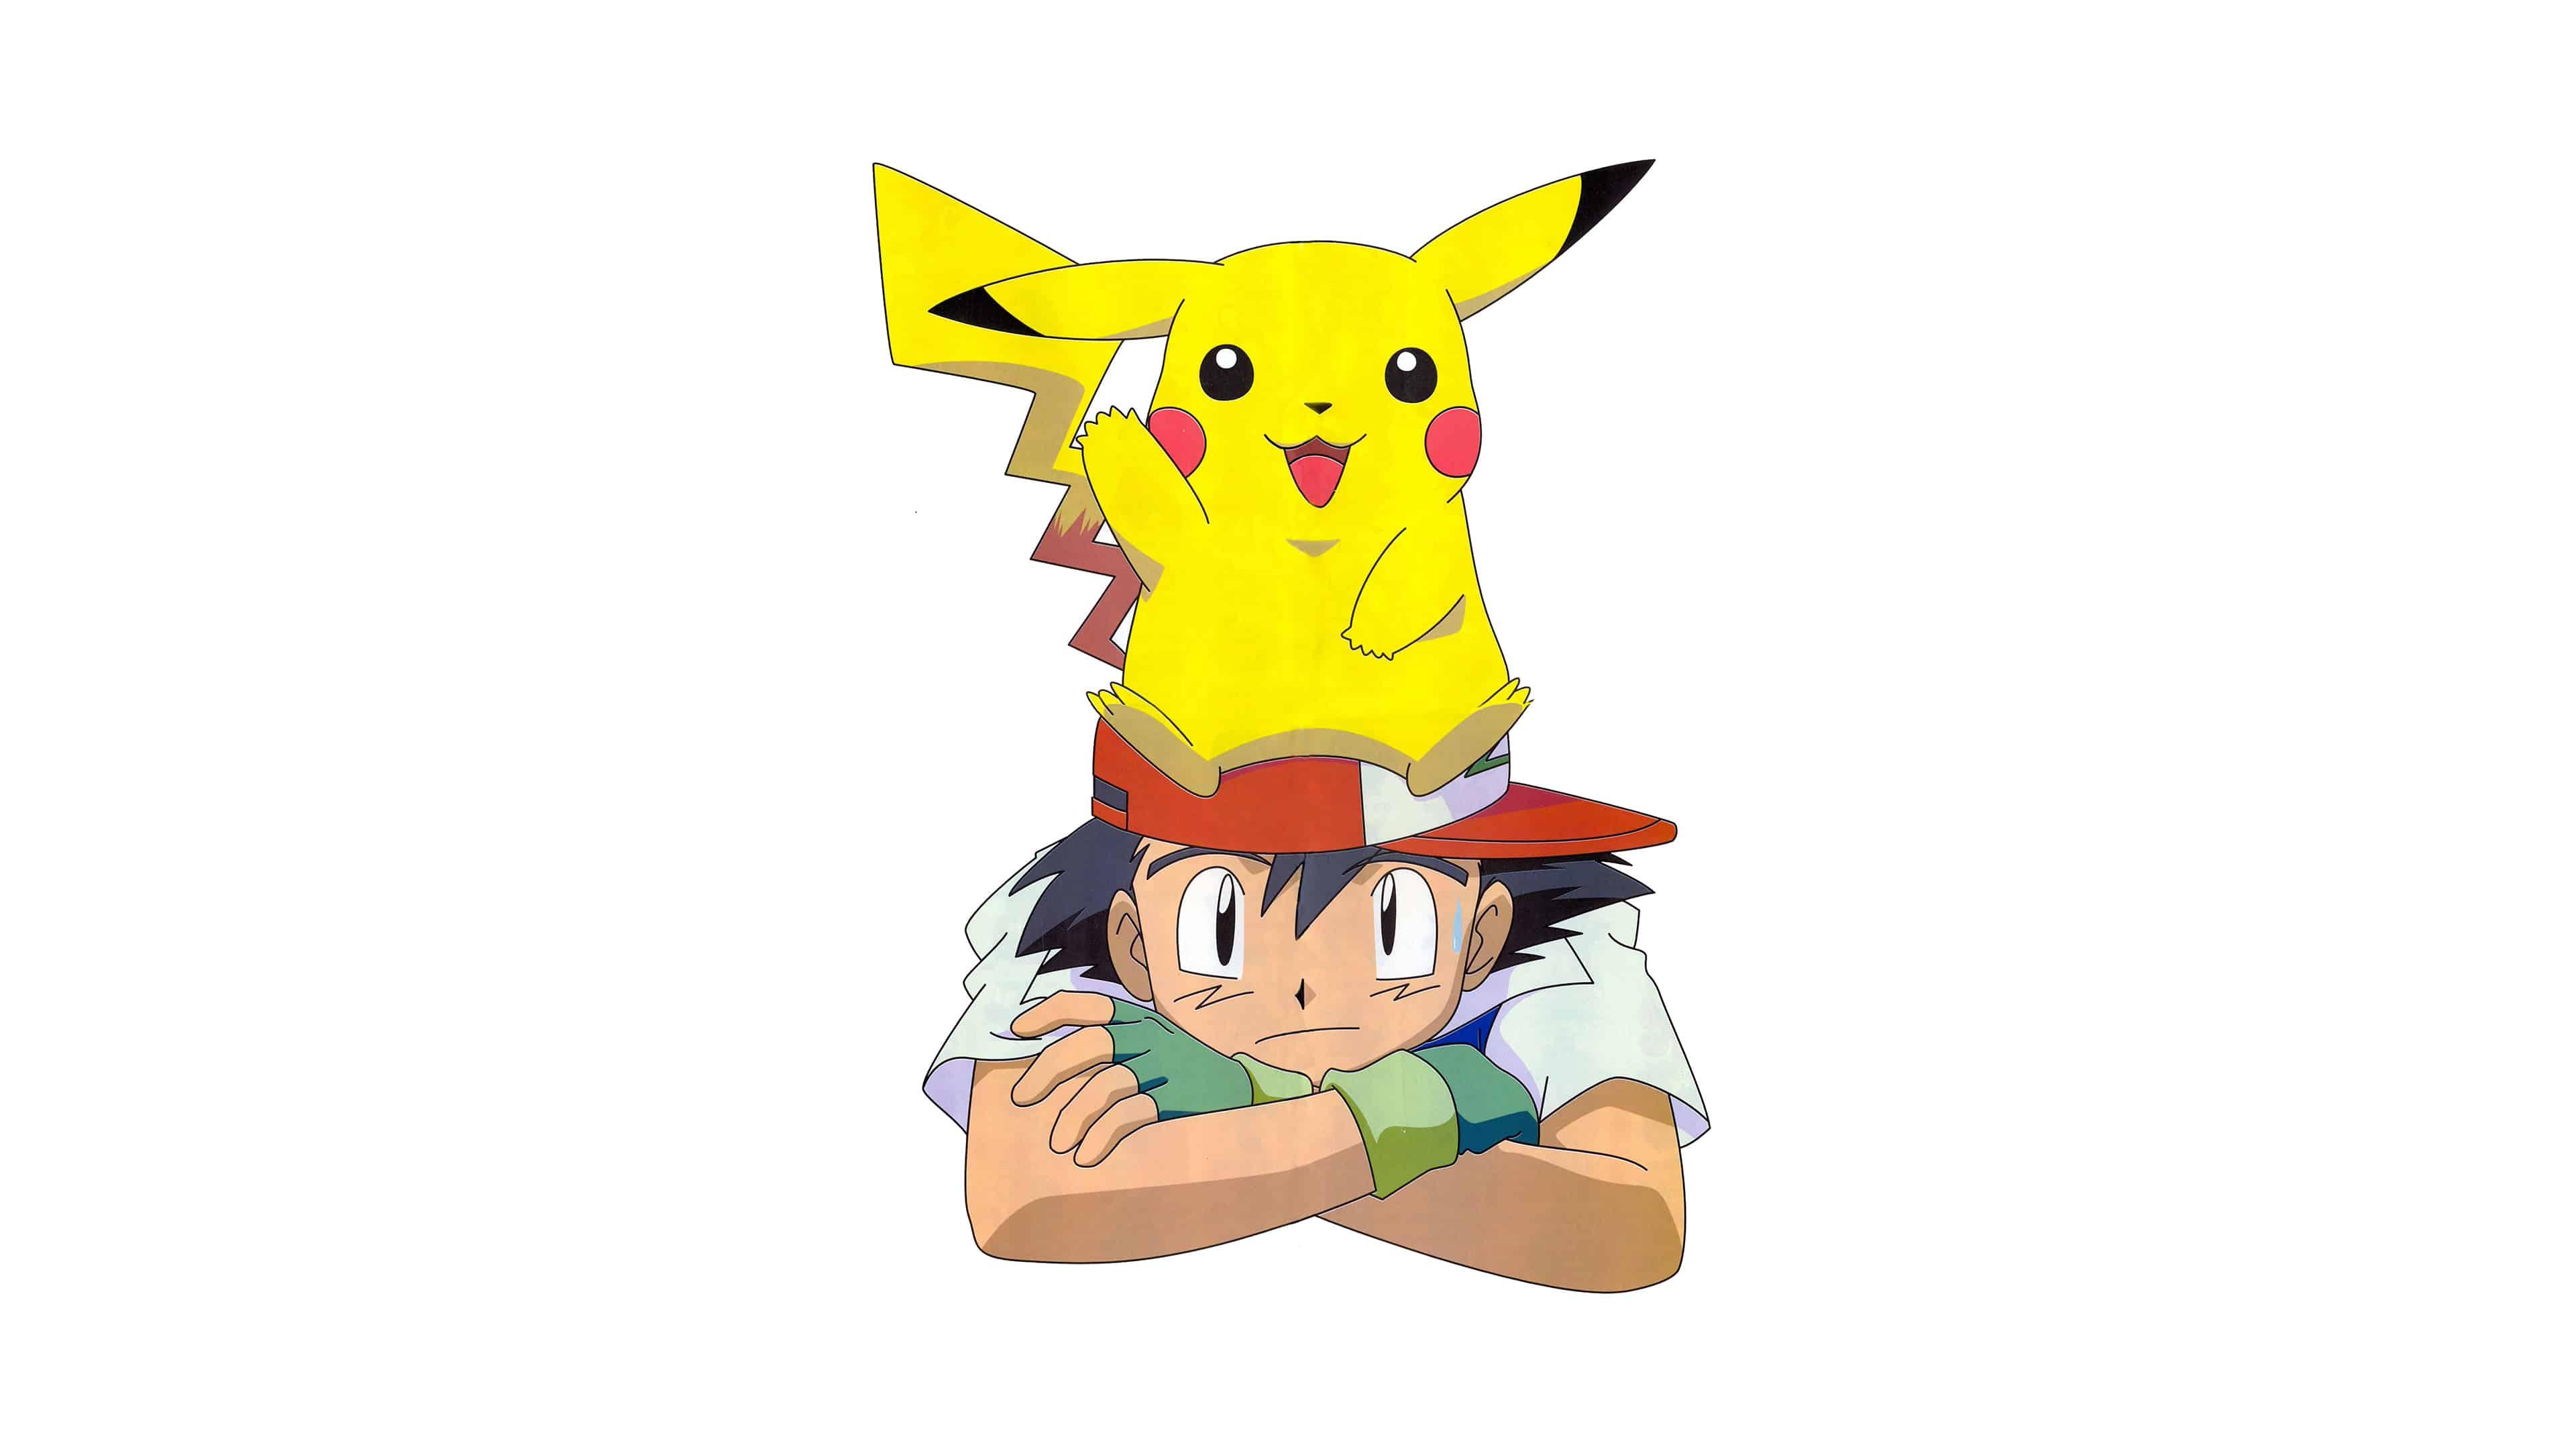 Pikachu 4k Wallpapers Top Free Pikachu 4k Backgrounds Wallpaperaccess